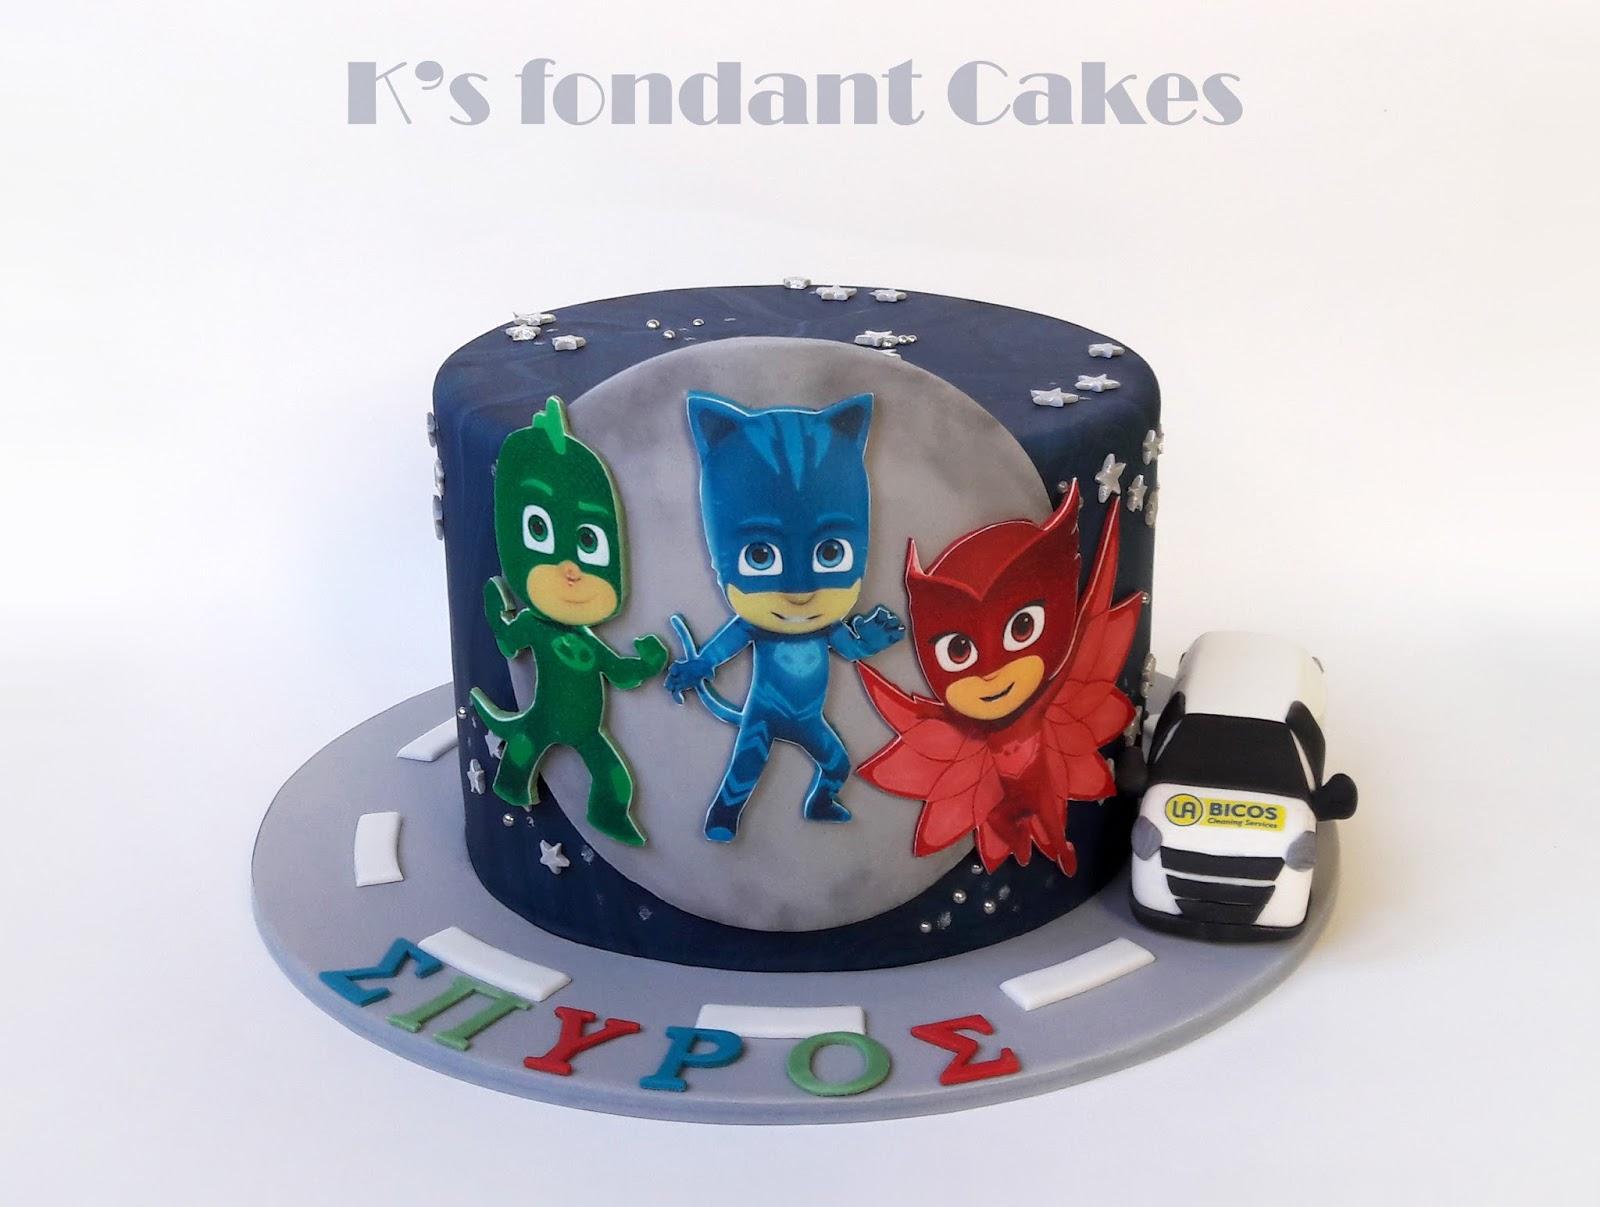 PJ masks cake - Ήρωες με Πυτζάμες  970a562af7f